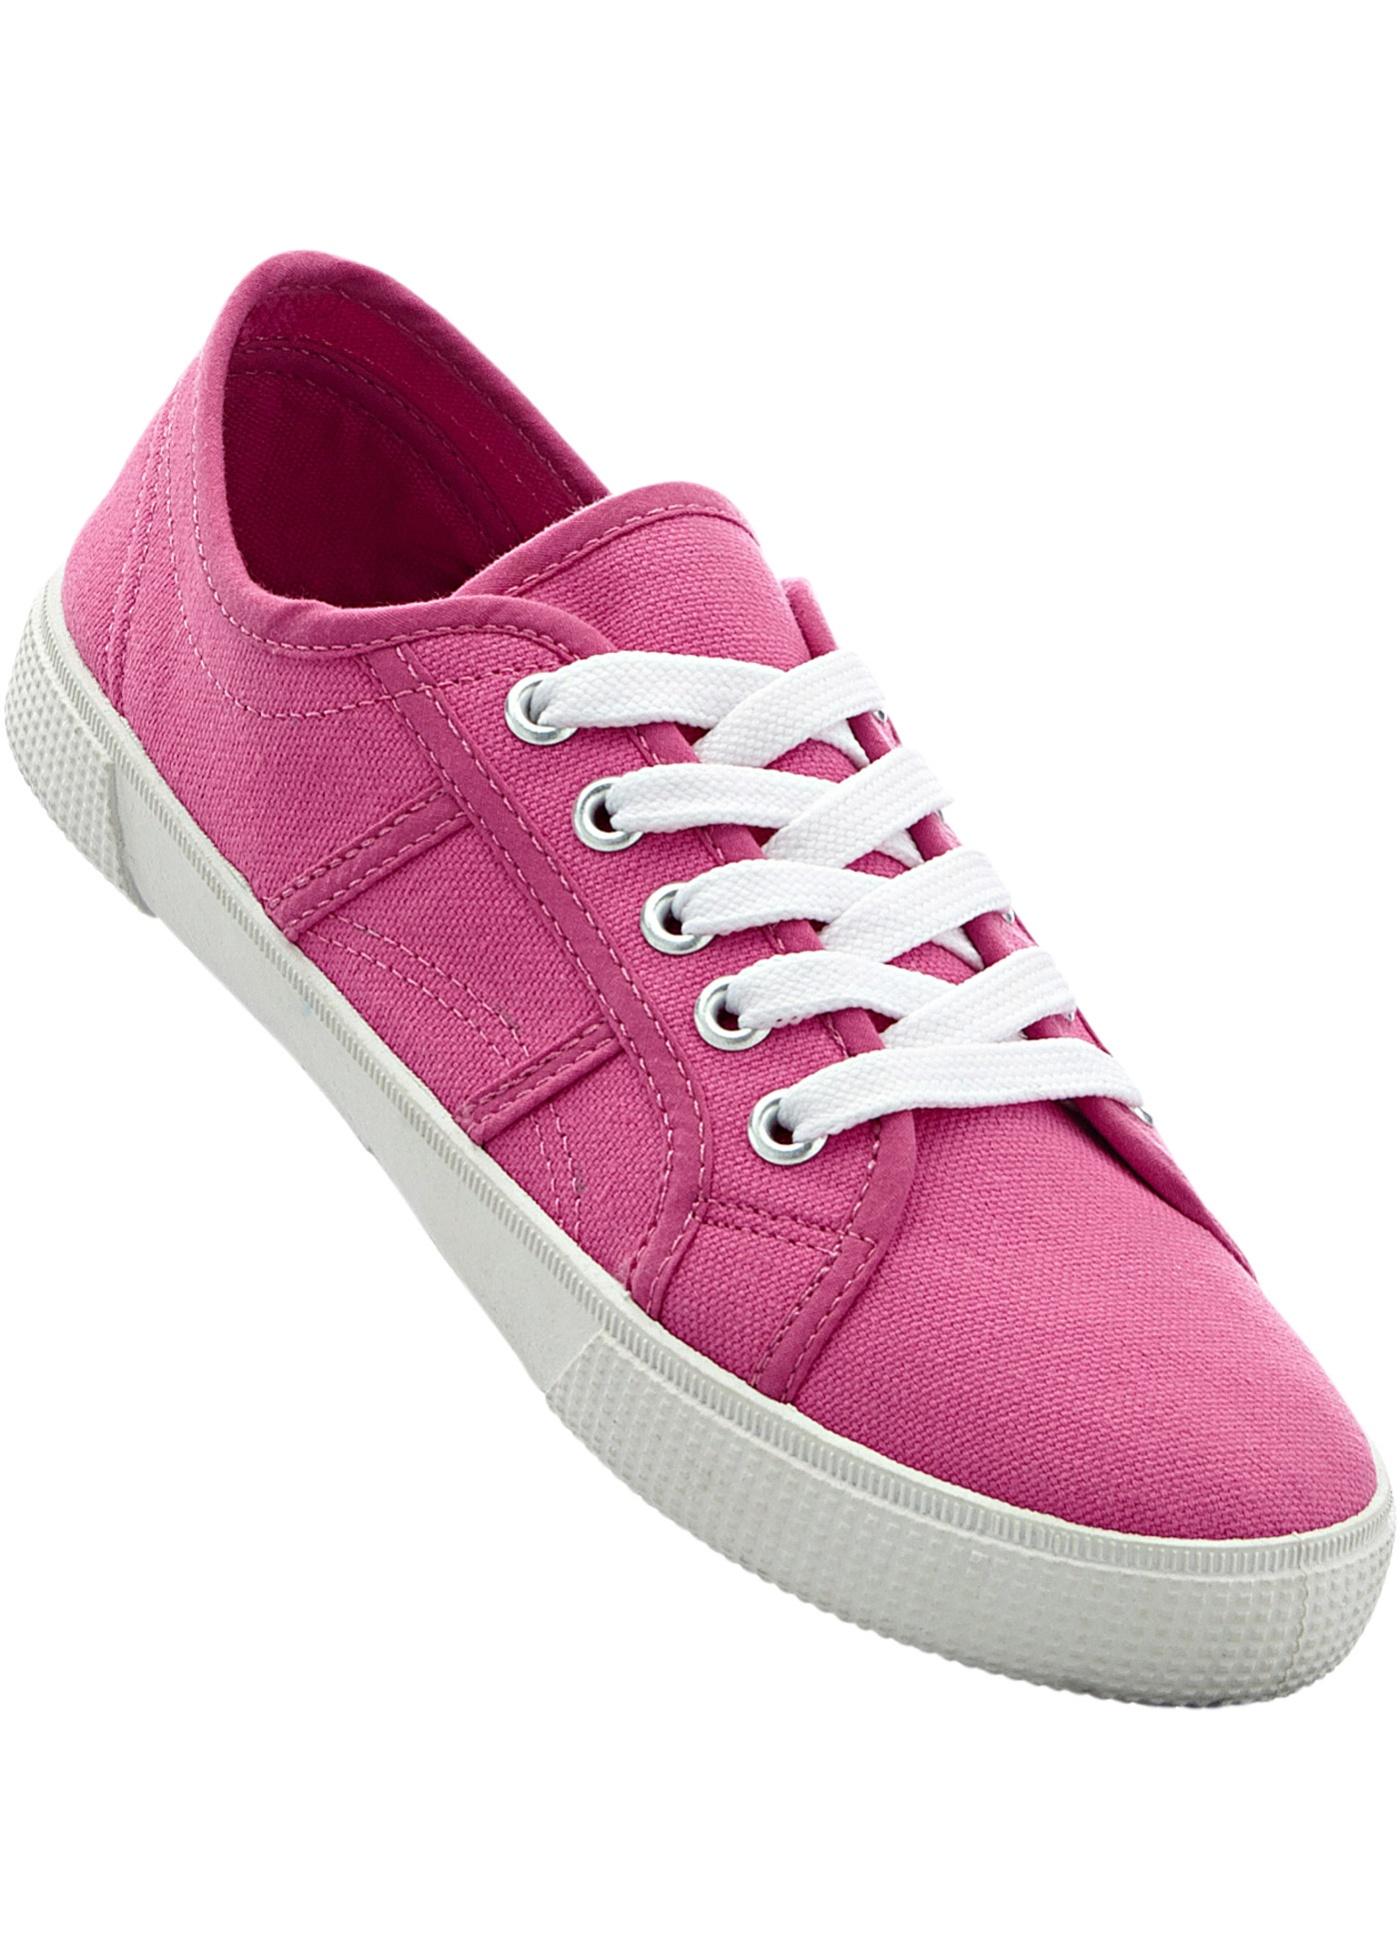 Sneaker  rosa  - bpc sele